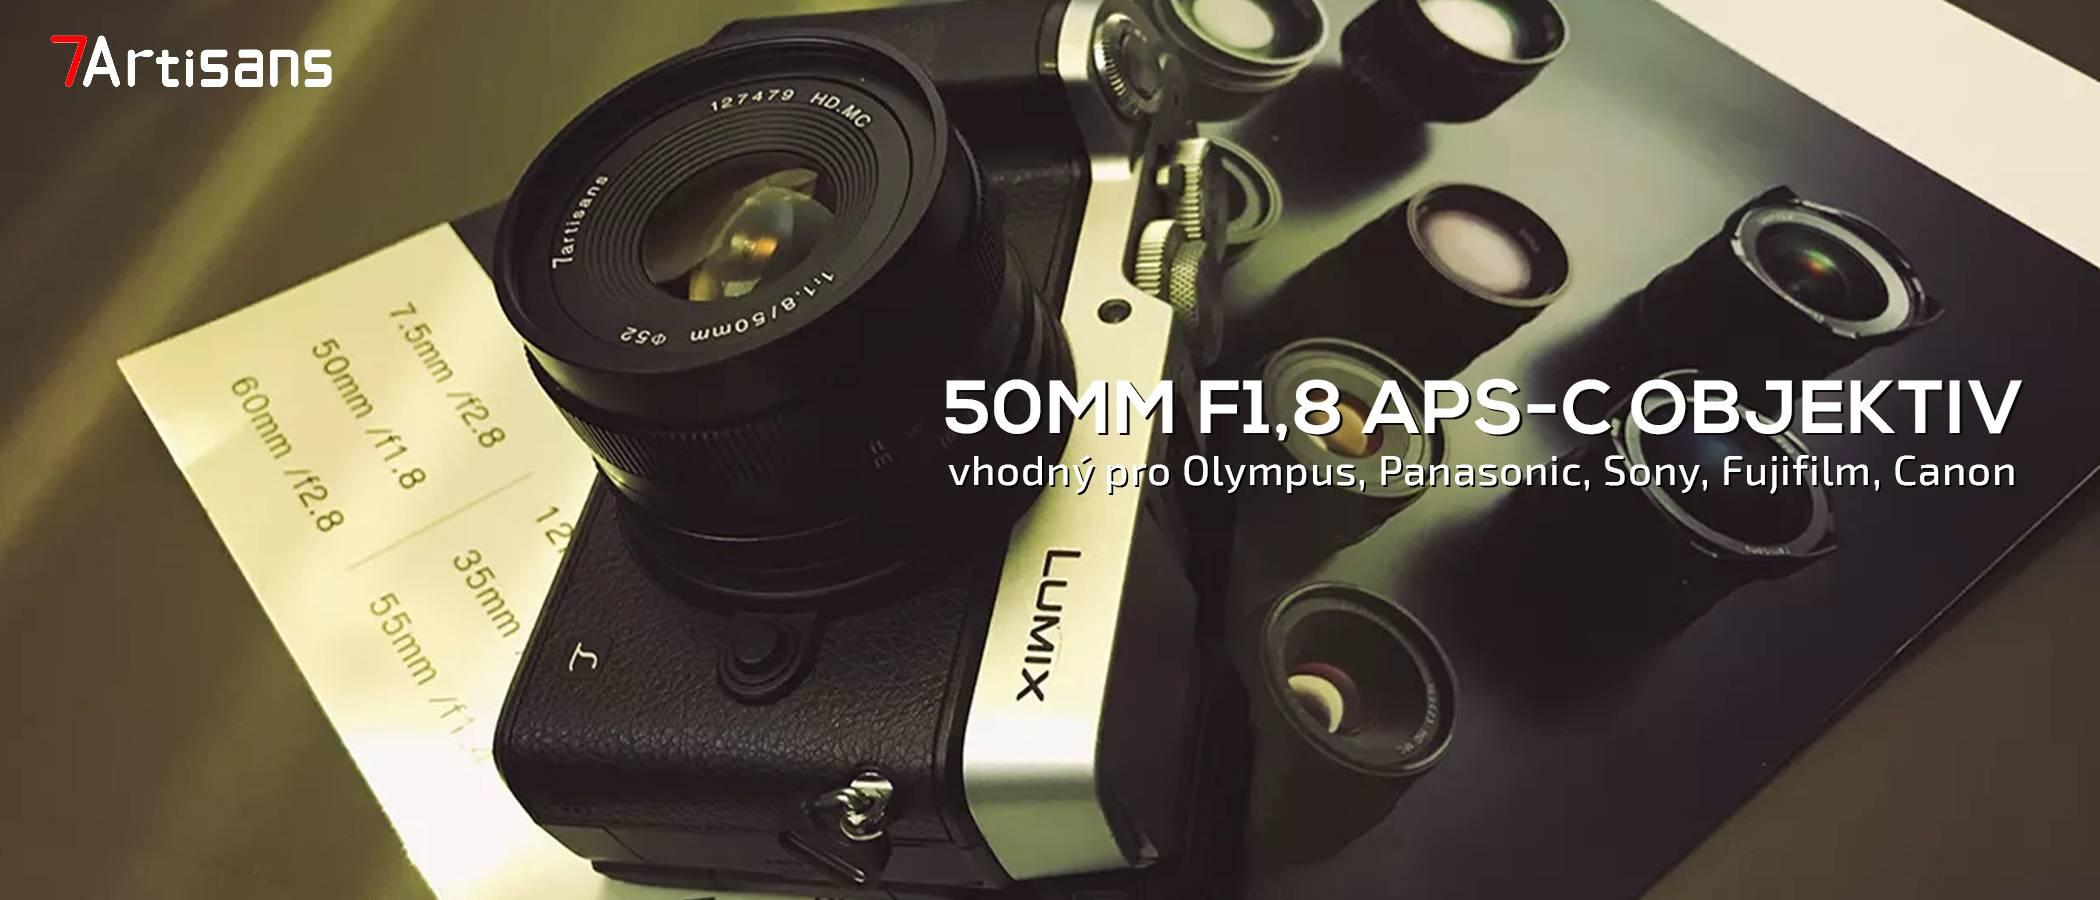 film-technika-7-artisans-50-mm-aps-c-objektiv-all